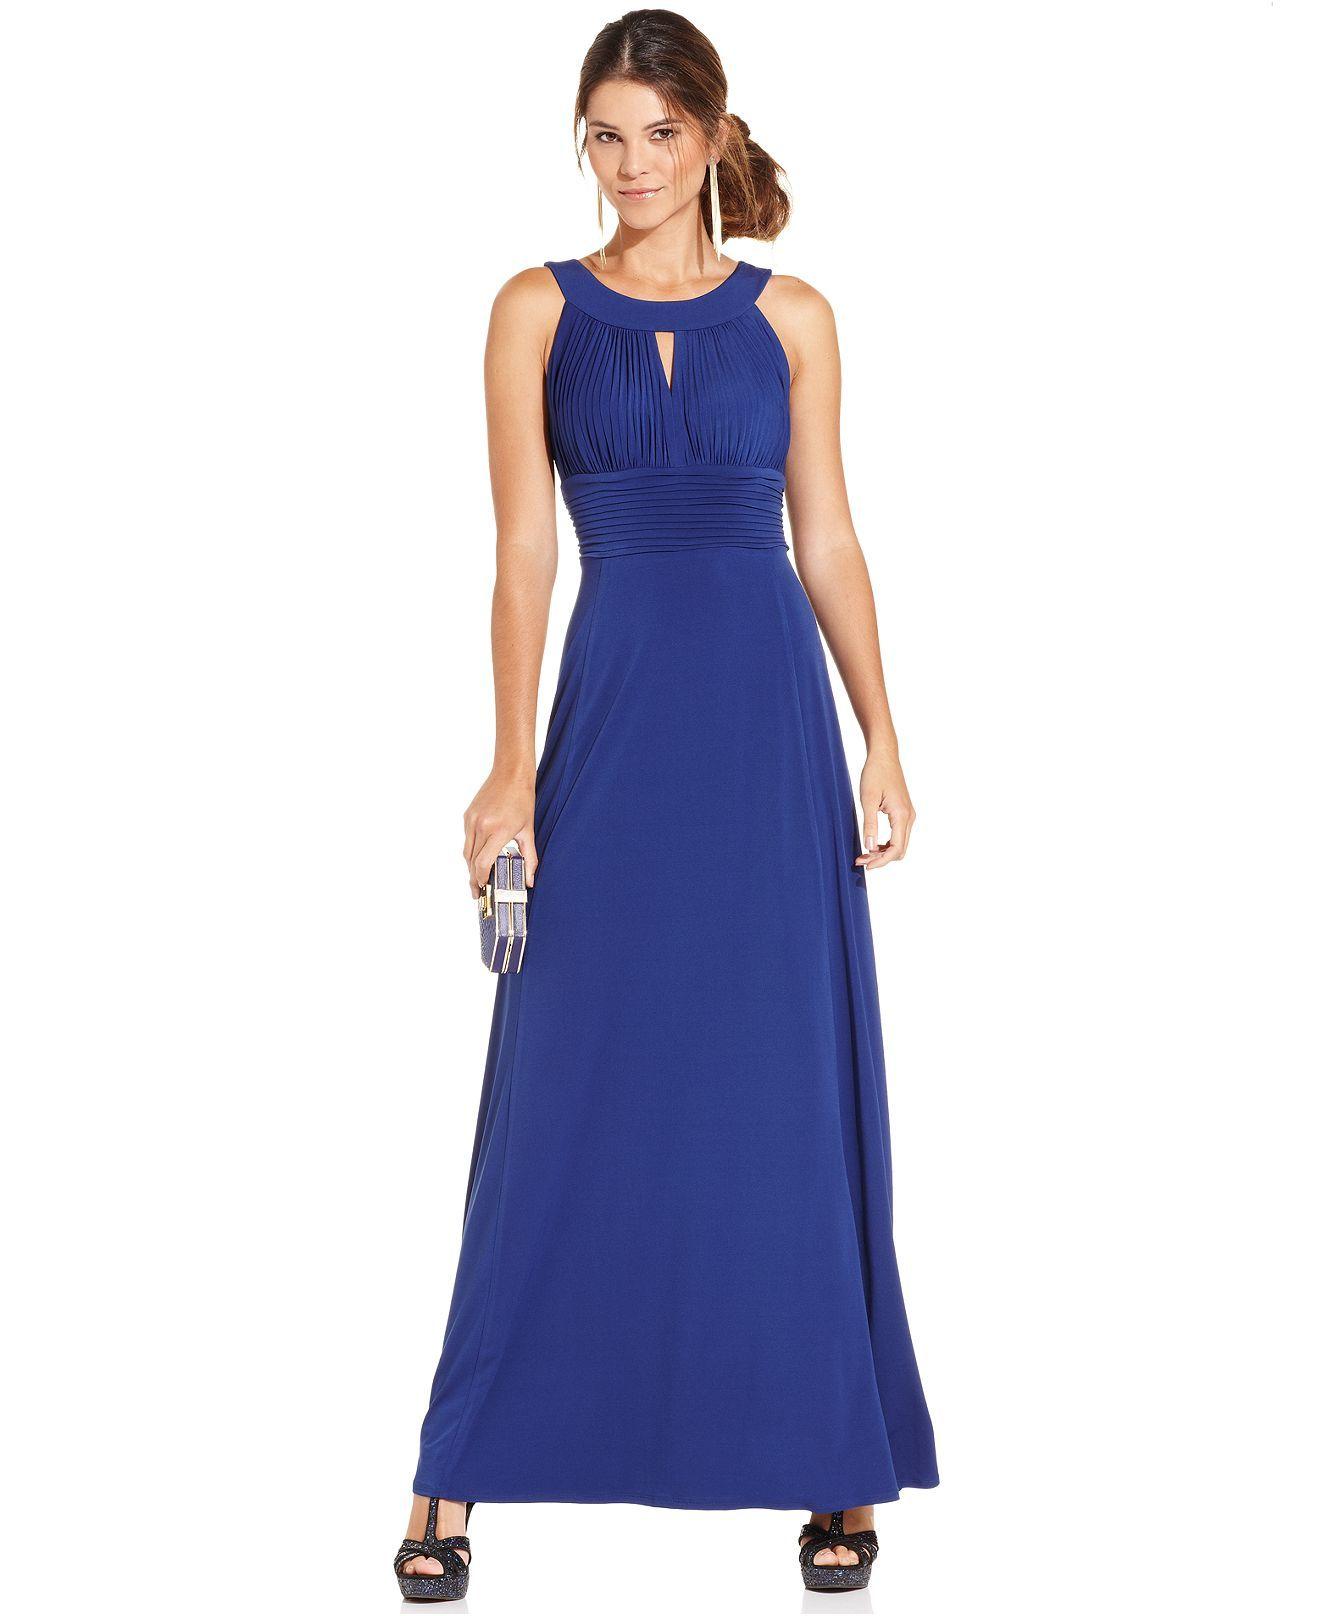 Macy's party dresses weddings  Sangria Sleeveless Keyhole Gown  Maxi Dresses  Women  Macyus